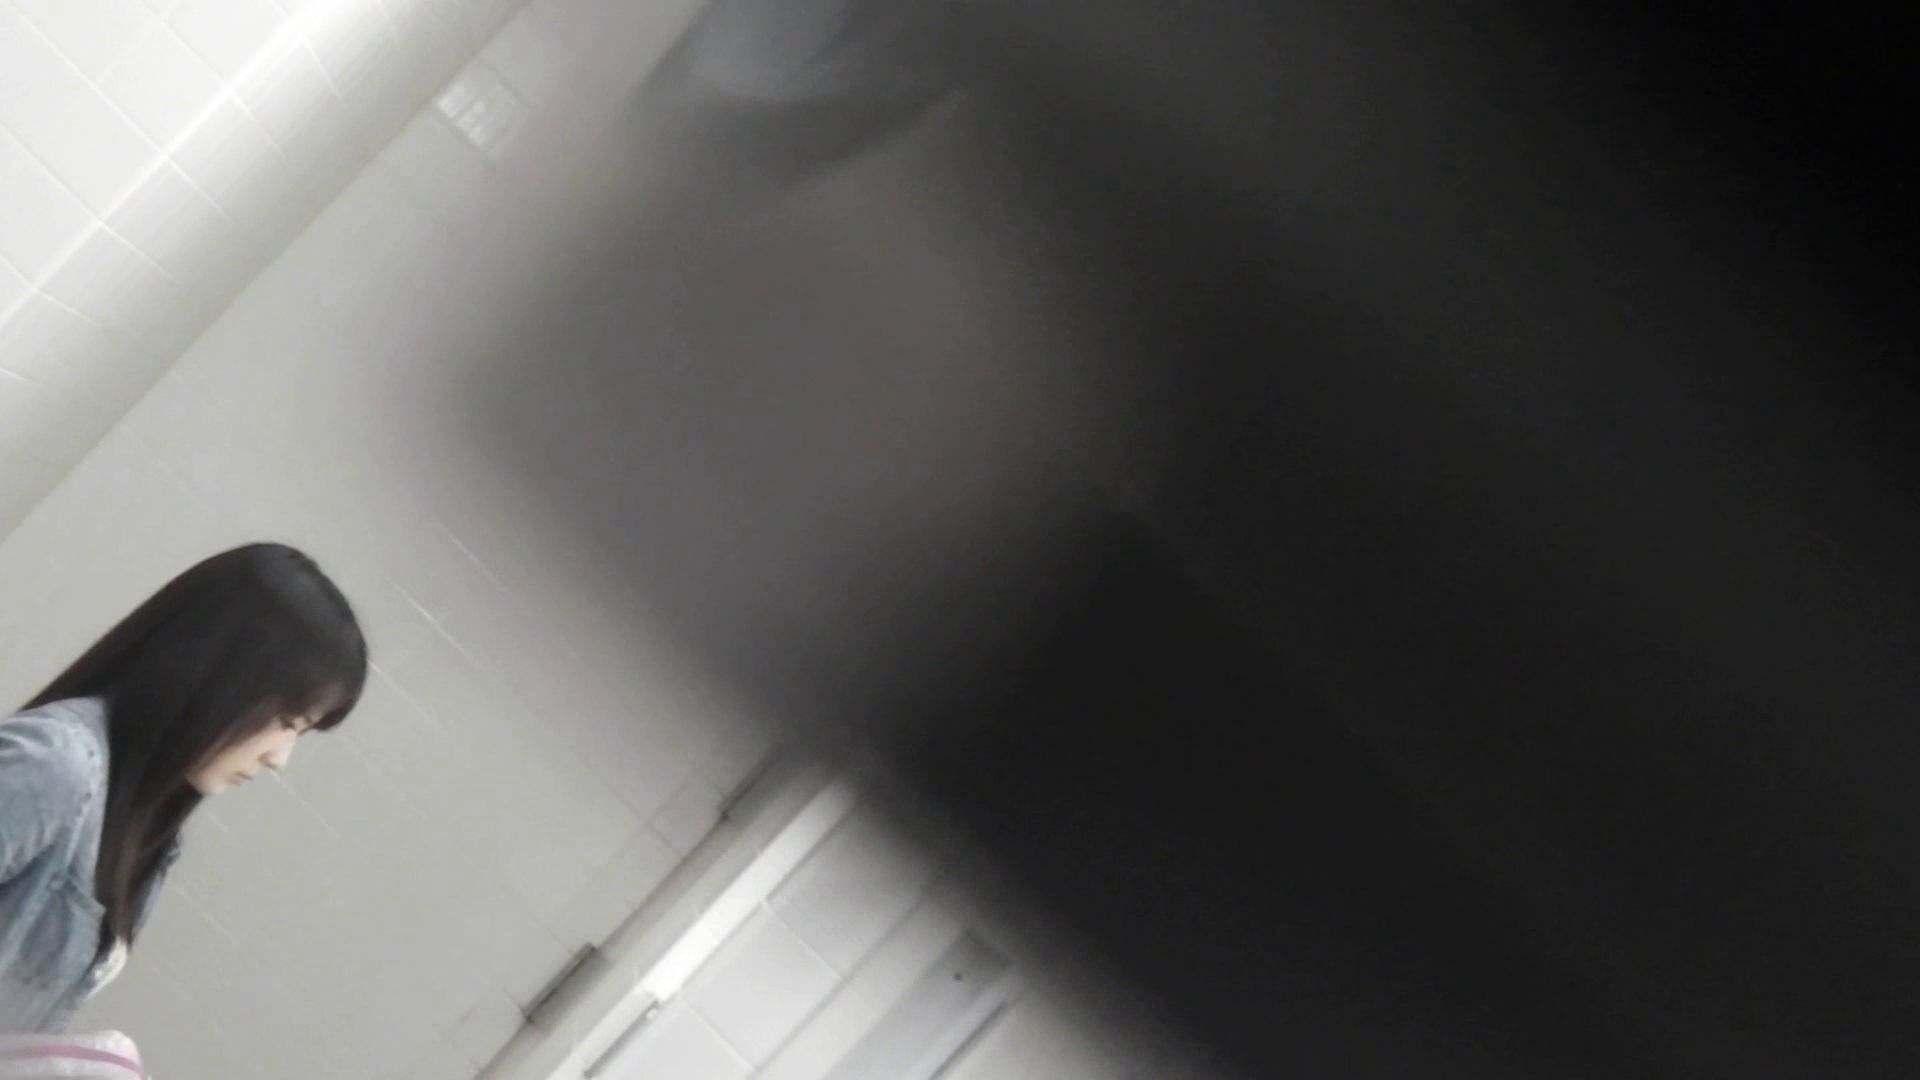 vol.20 命がけ潜伏洗面所! 清楚系可愛いギャル 洗面所 盗撮アダルト動画キャプチャ 56PICs 11